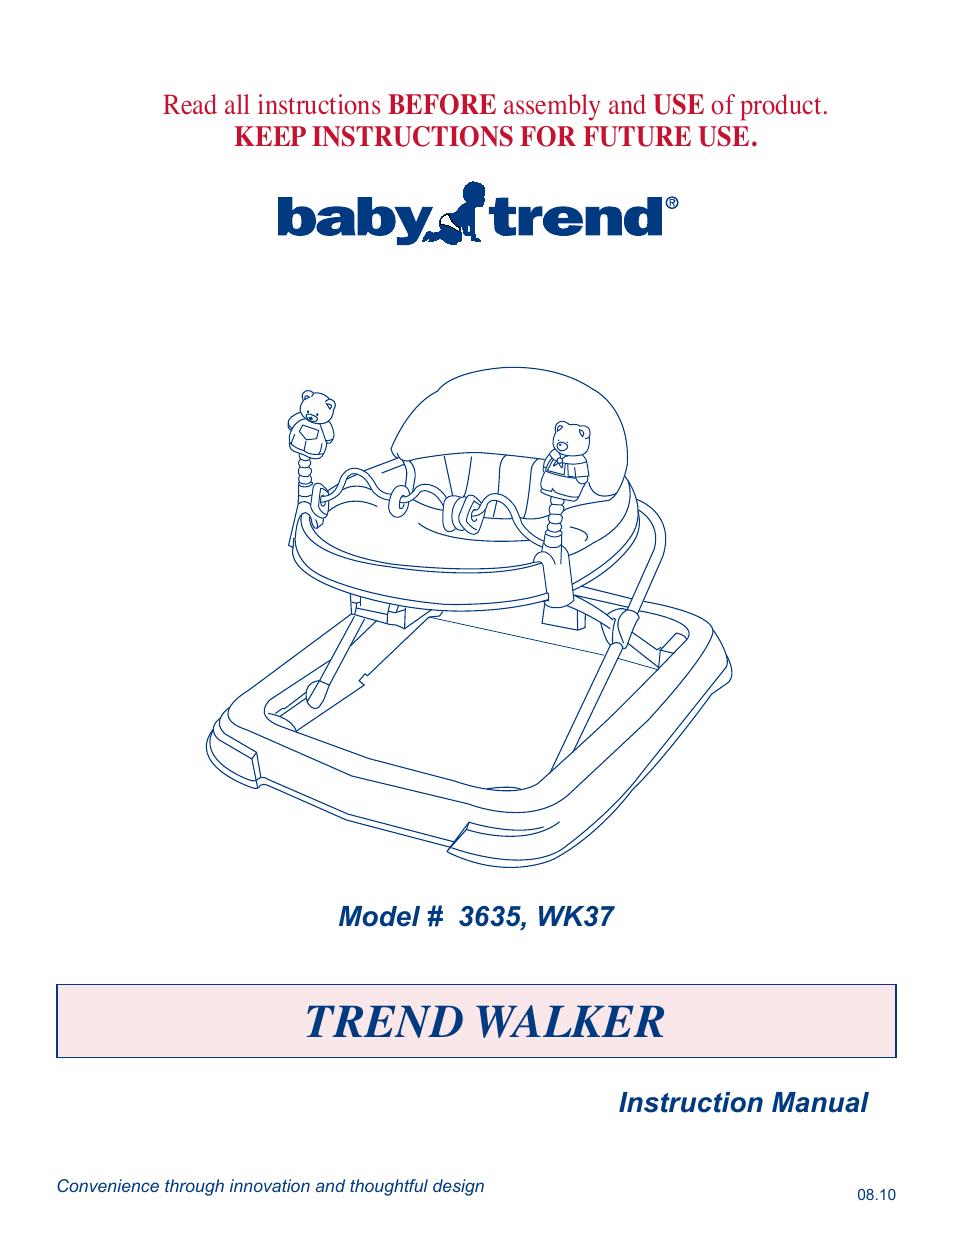 baby trend walker wk37 user manual 4 pages also for walker 3635 rh manualsdir com Owner Manual Babies Owner Manual Babies